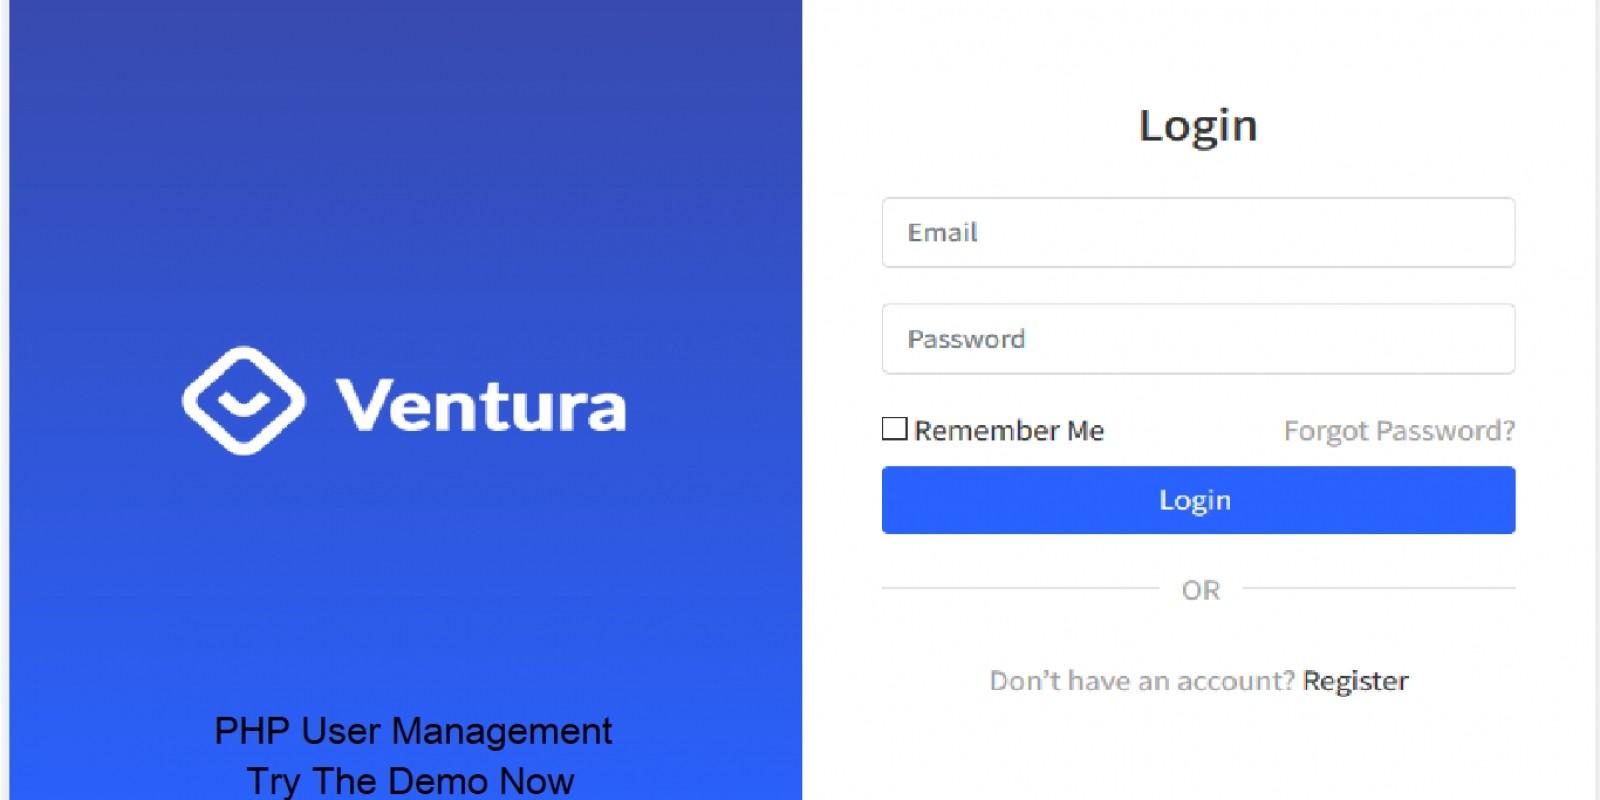 Ventura - User Management PHP Script